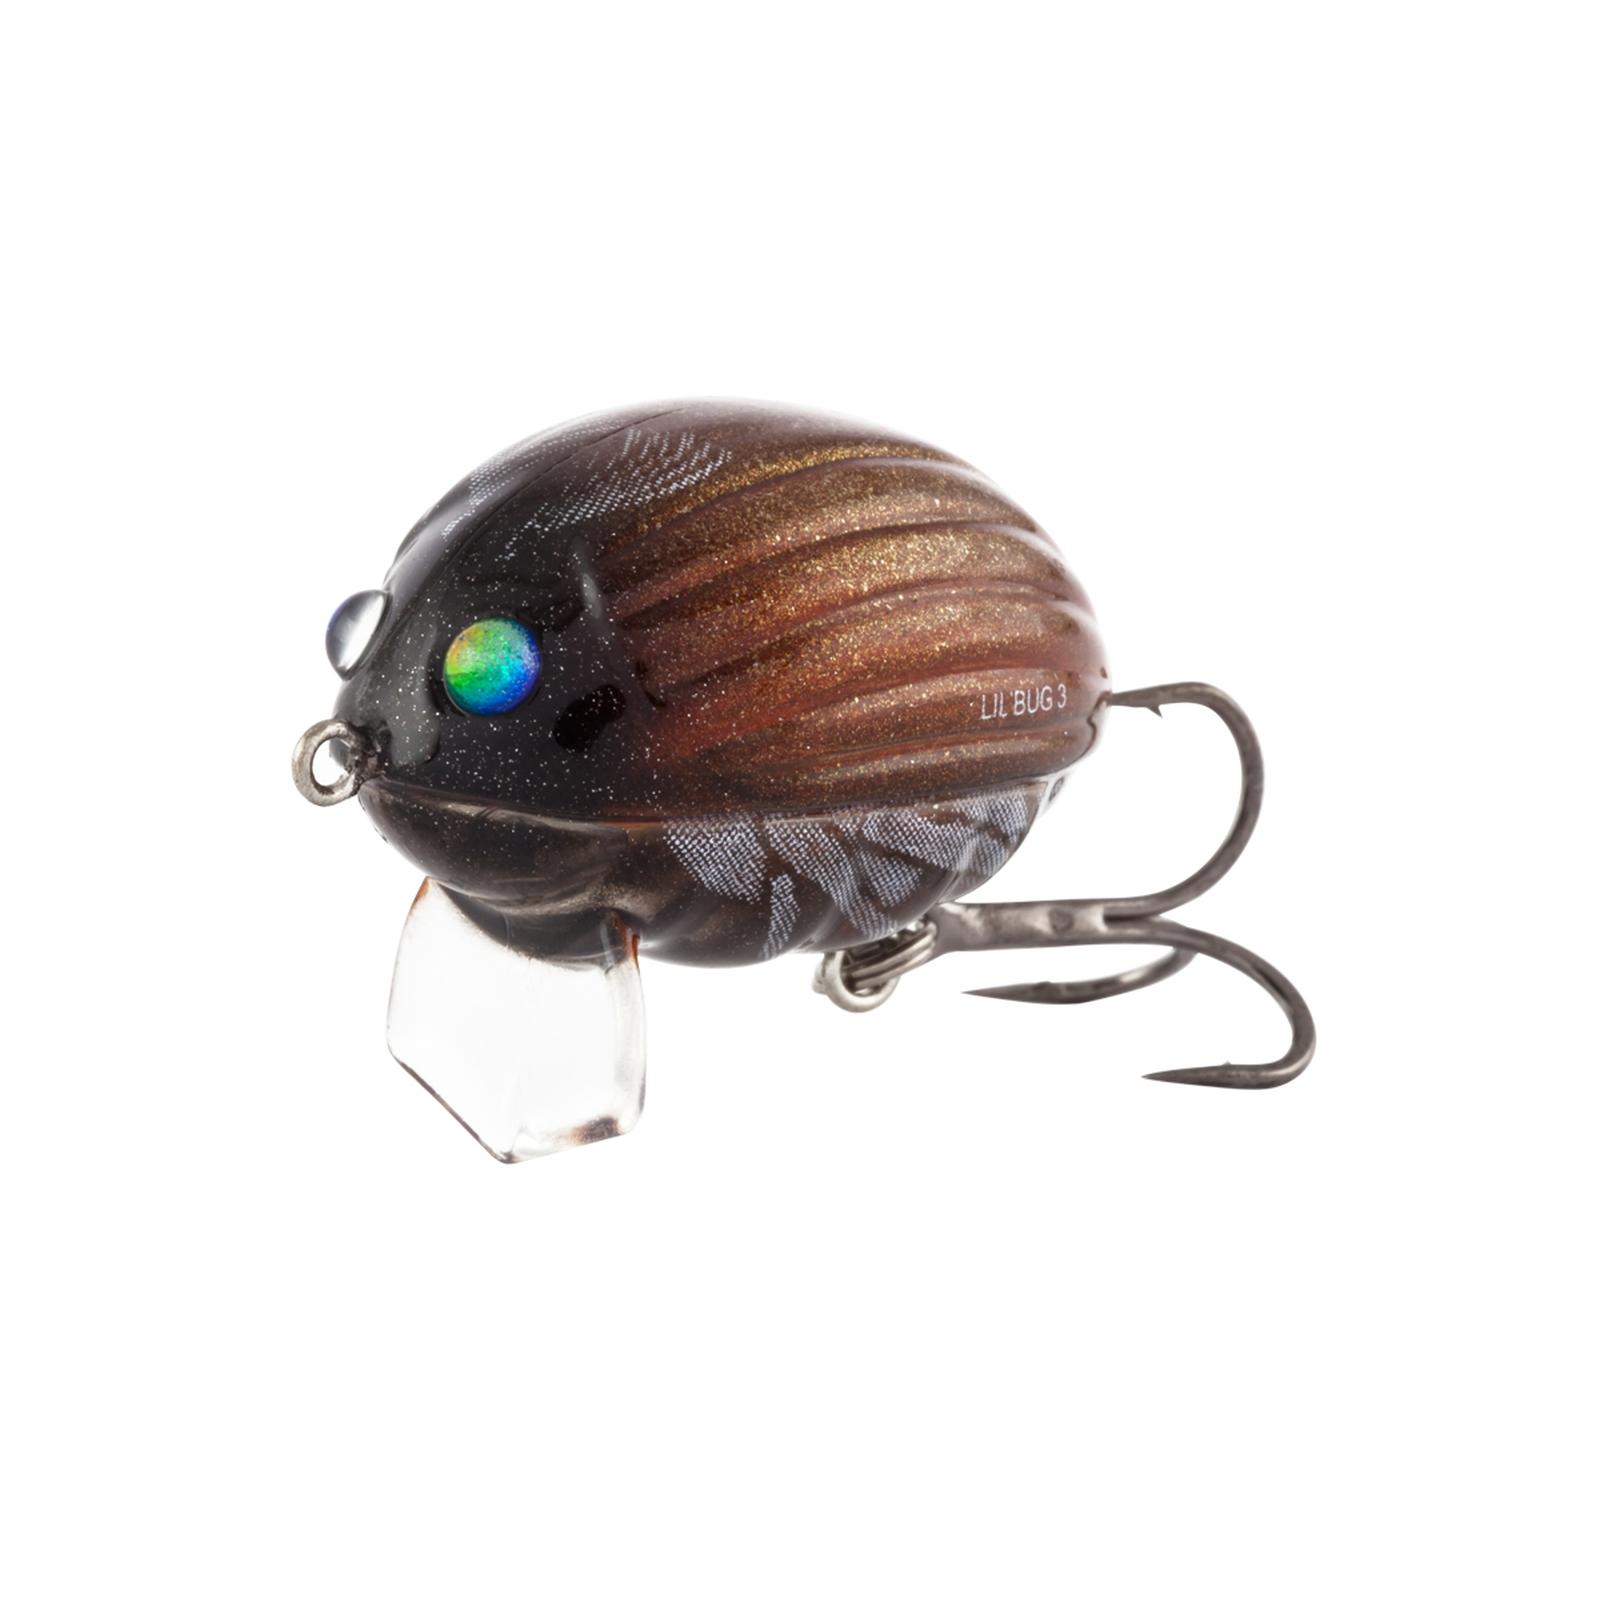 Salmo Lil Bug Floating 2cm 2,8g Ladybird Wobbler Raubfisch-Shop